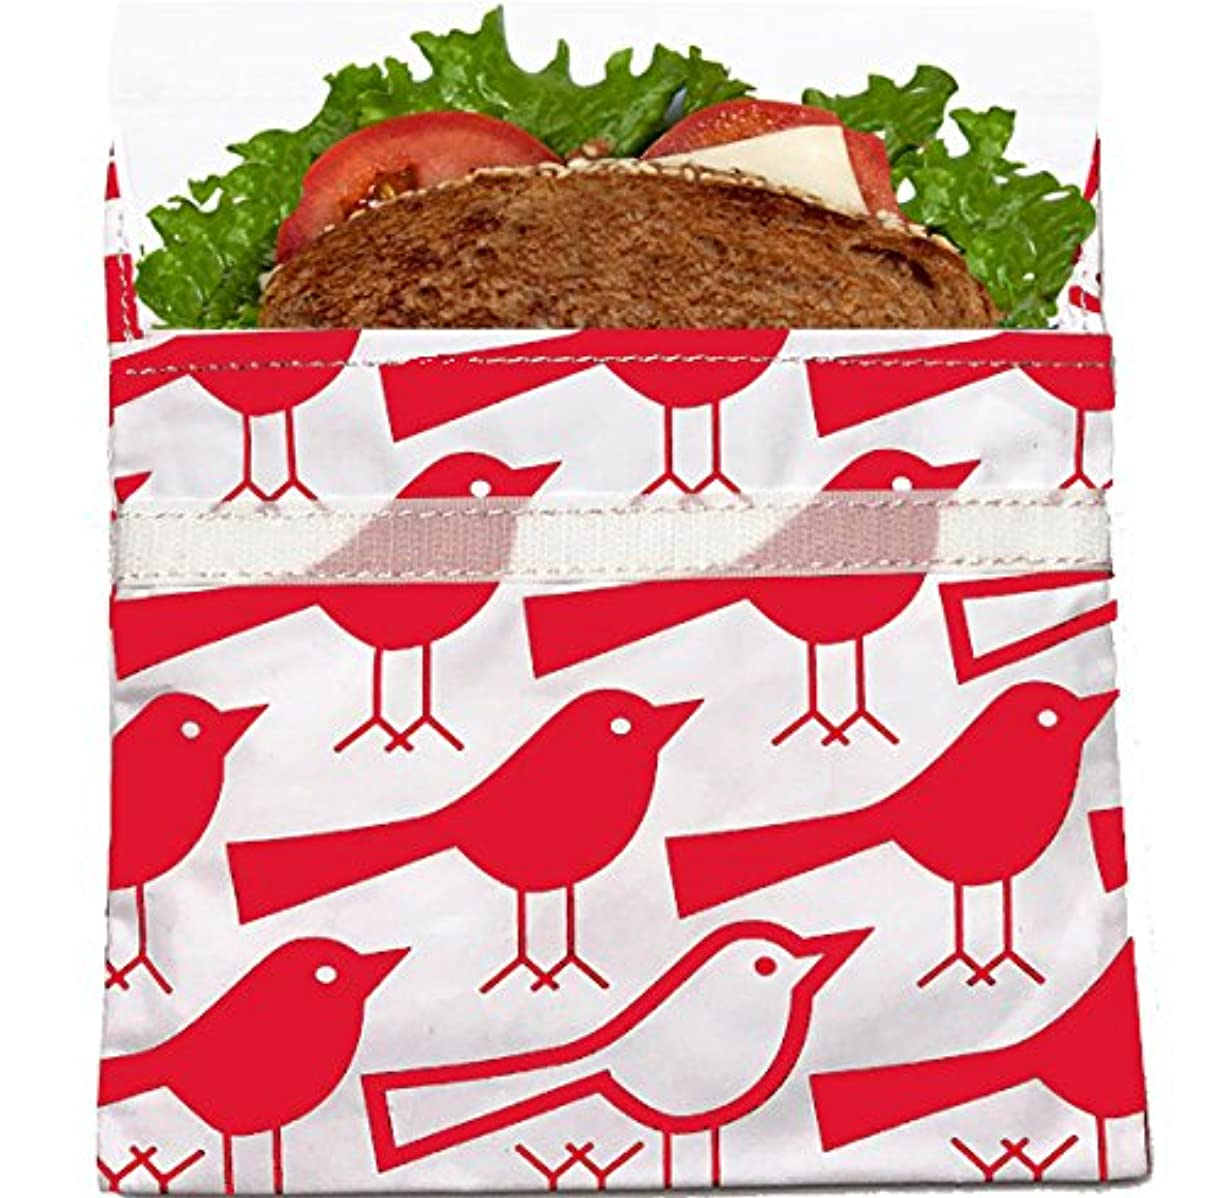 Lunchskins Reusable Sandwich Bag, Red Bird by LunchSkins